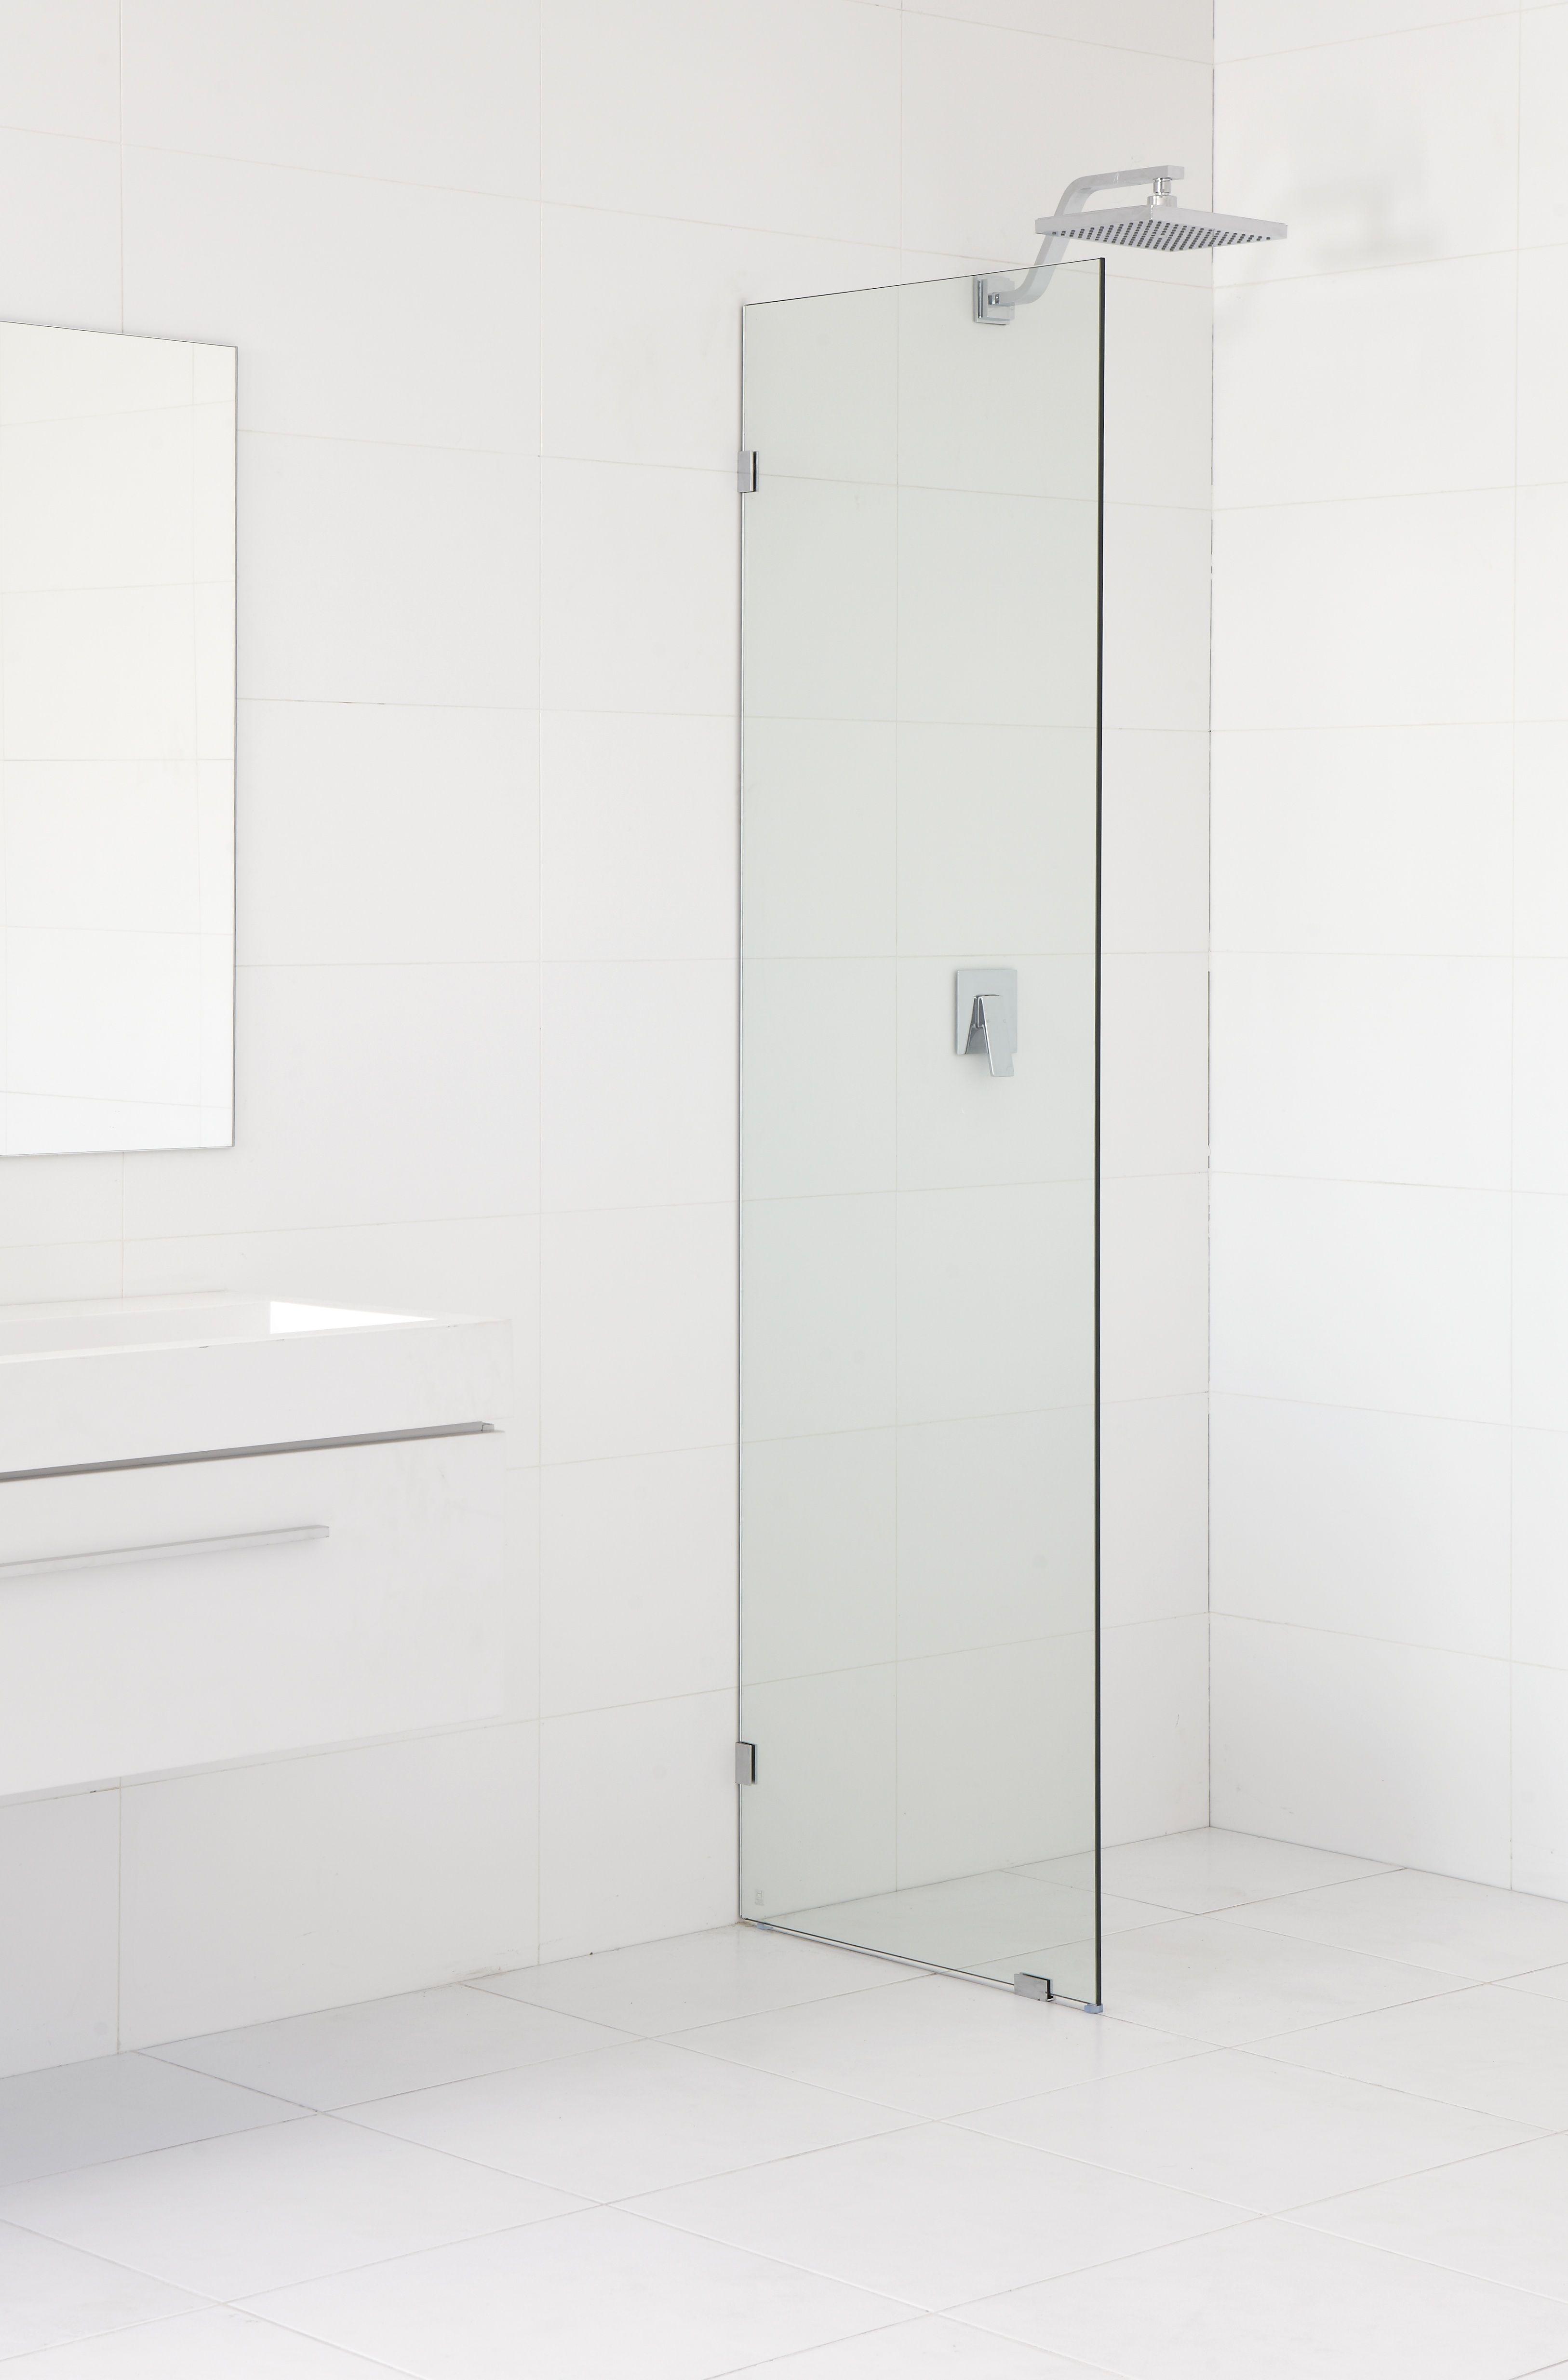 Highgrove 10 x 2000 x 600mm frameless glass shower panel kit highgrove 10 x 2000 x 600mm frameless glass shower panel kit bunnings warehouse dailygadgetfo Choice Image